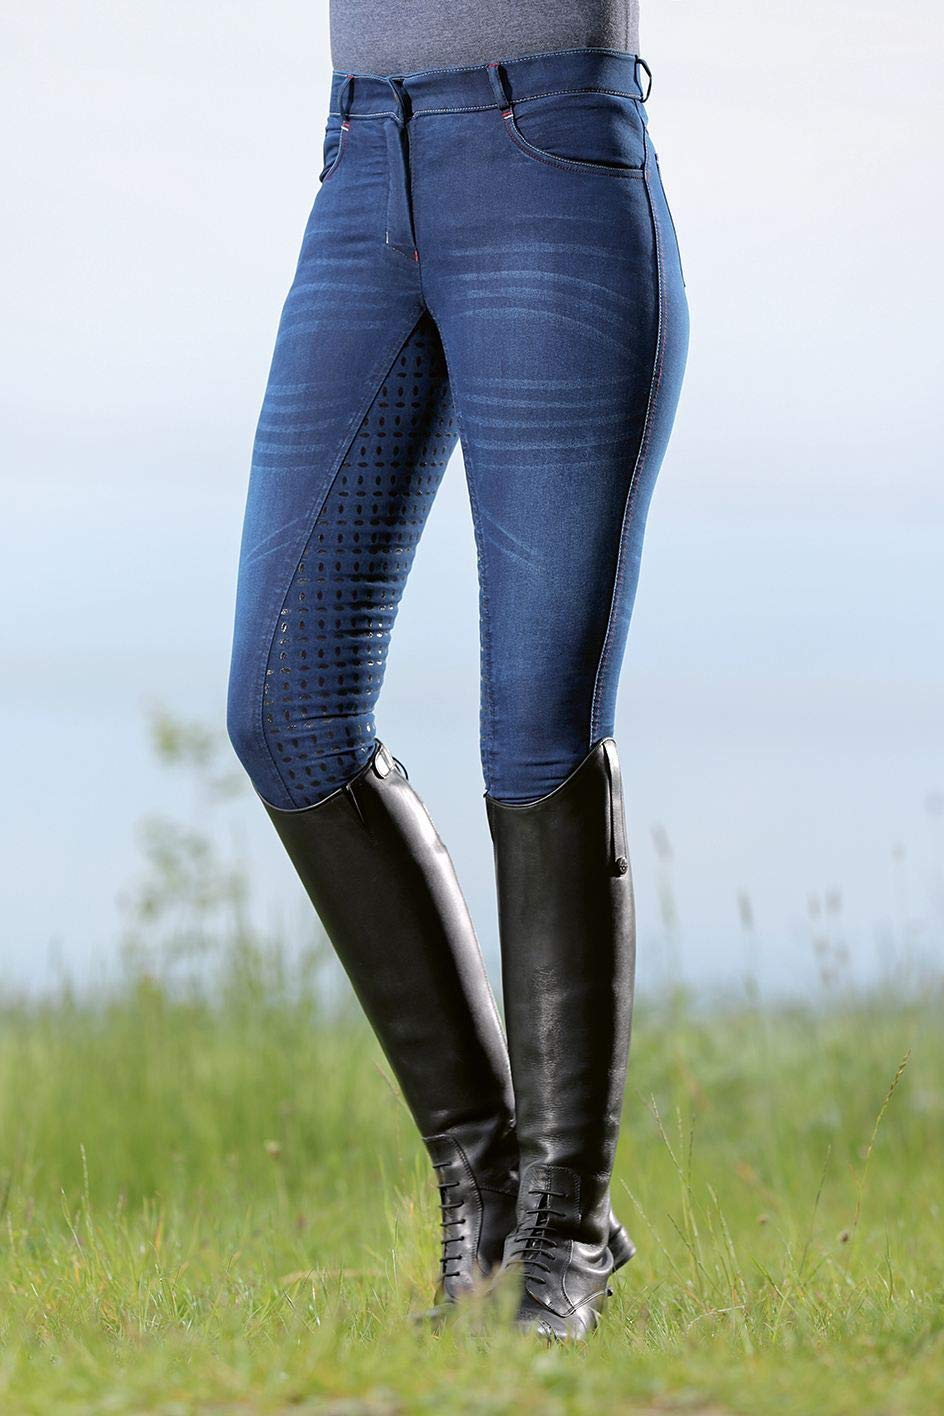 HKM Erwachsene Reithose-Summer Denim Easy-3//4 Silkonbesatz6100 Hose 76 Jeansblau